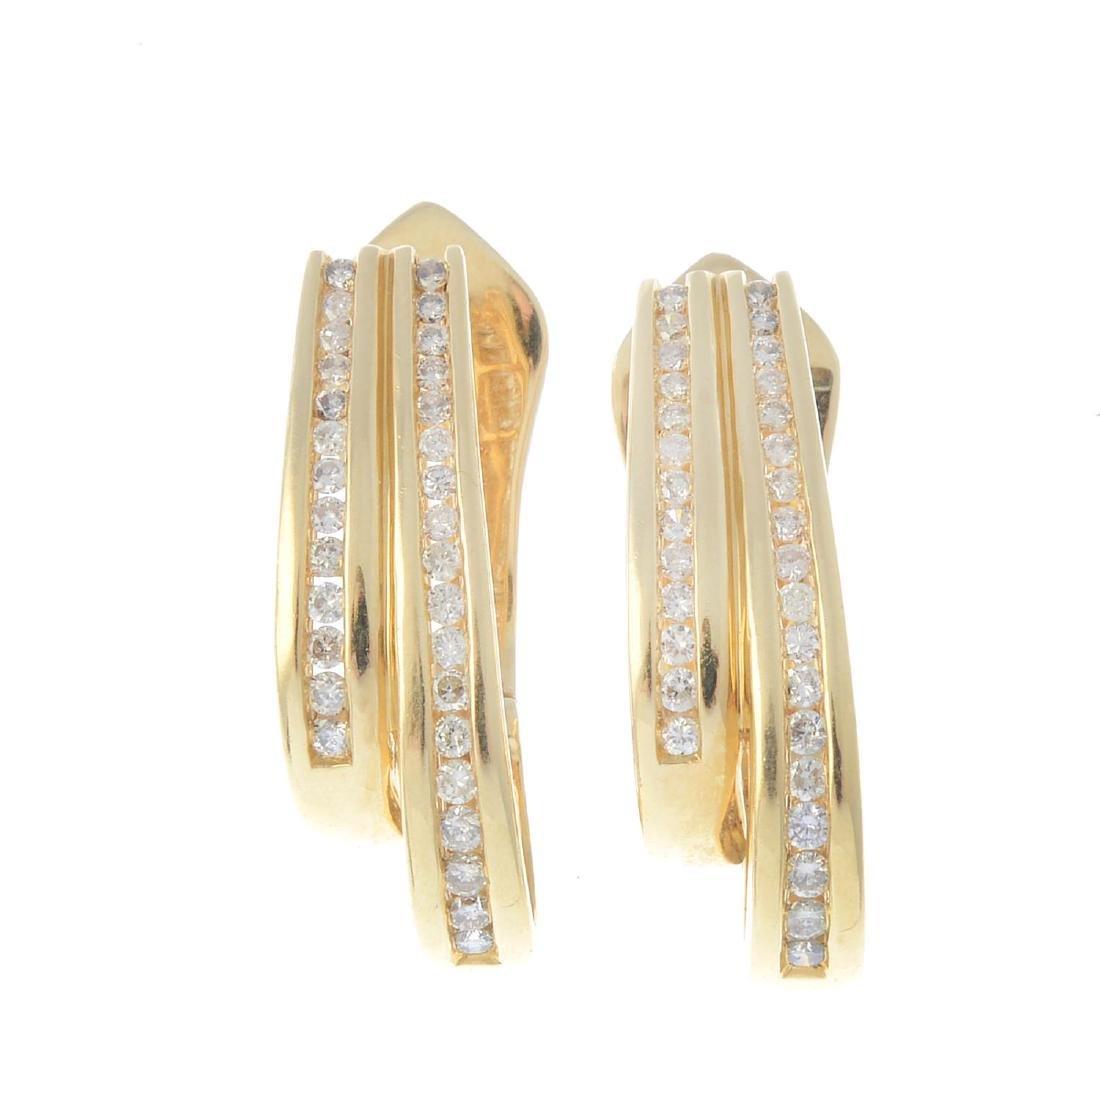 (205872) A pair of diamond earrings. Each designed as